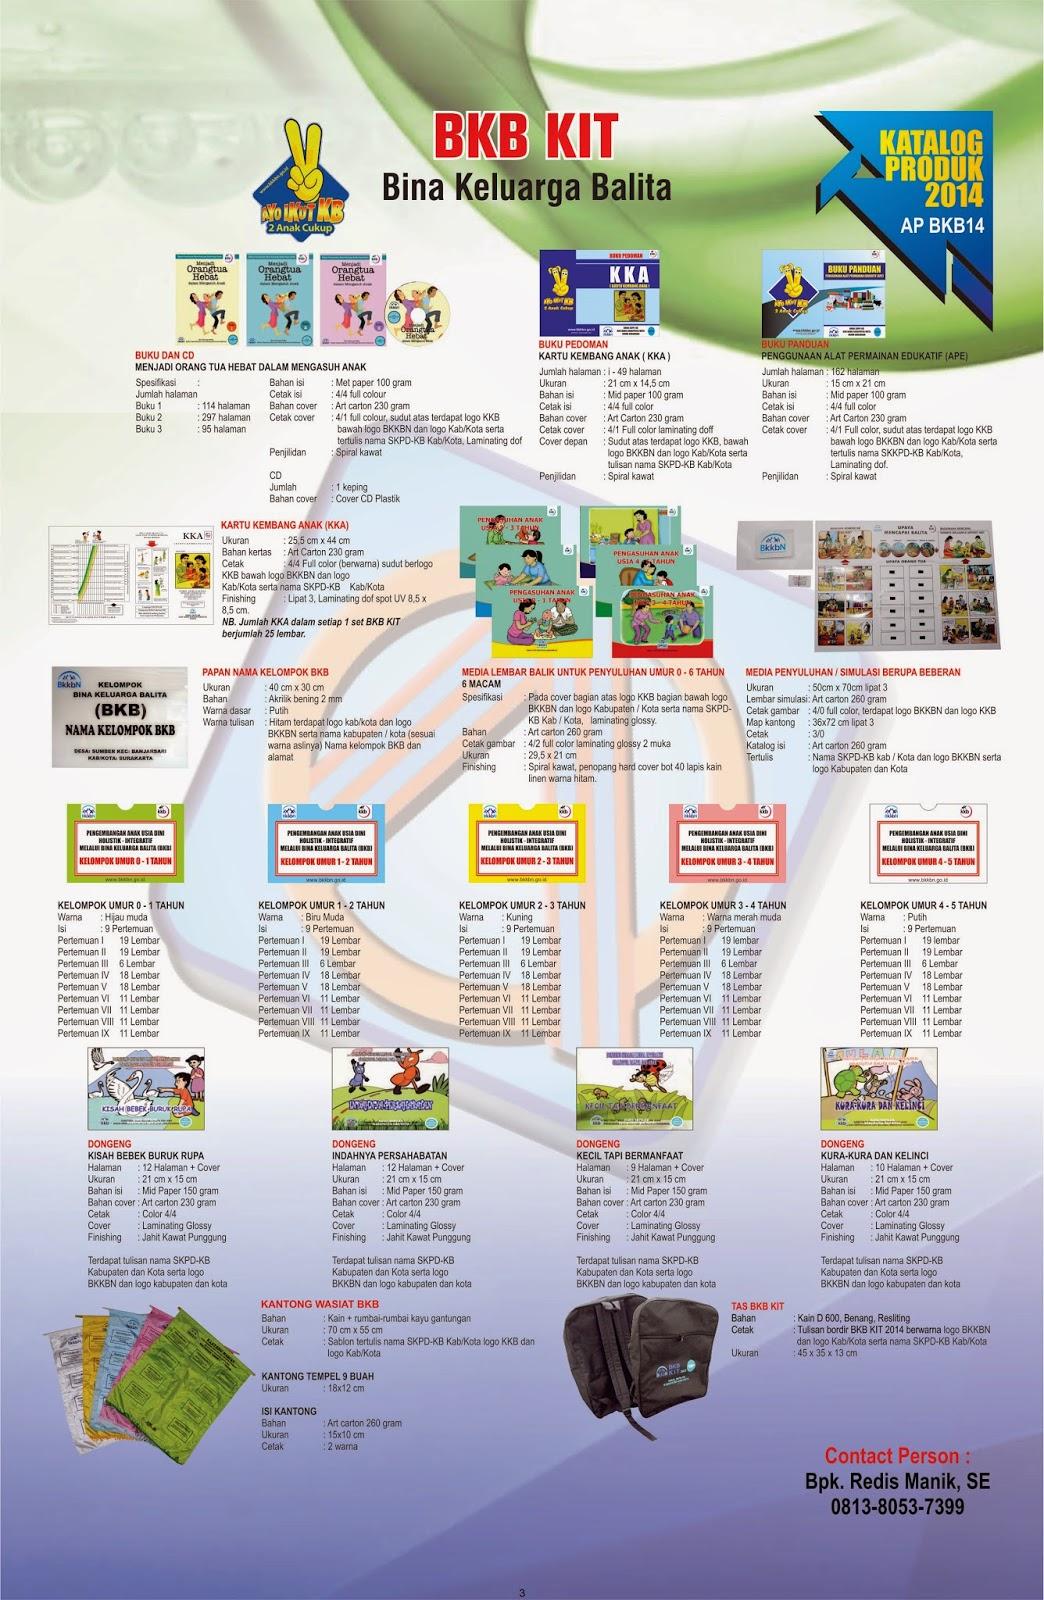 Bkb Kit Dak Bkkbn 2014 ~Rab bkb kit dak bkkbn 2014, DAK BKKBN 2014 |BKB KIT 2014, PAKET BKB KIT BKKBN 2014, BKB KIT BKKBN 2014,